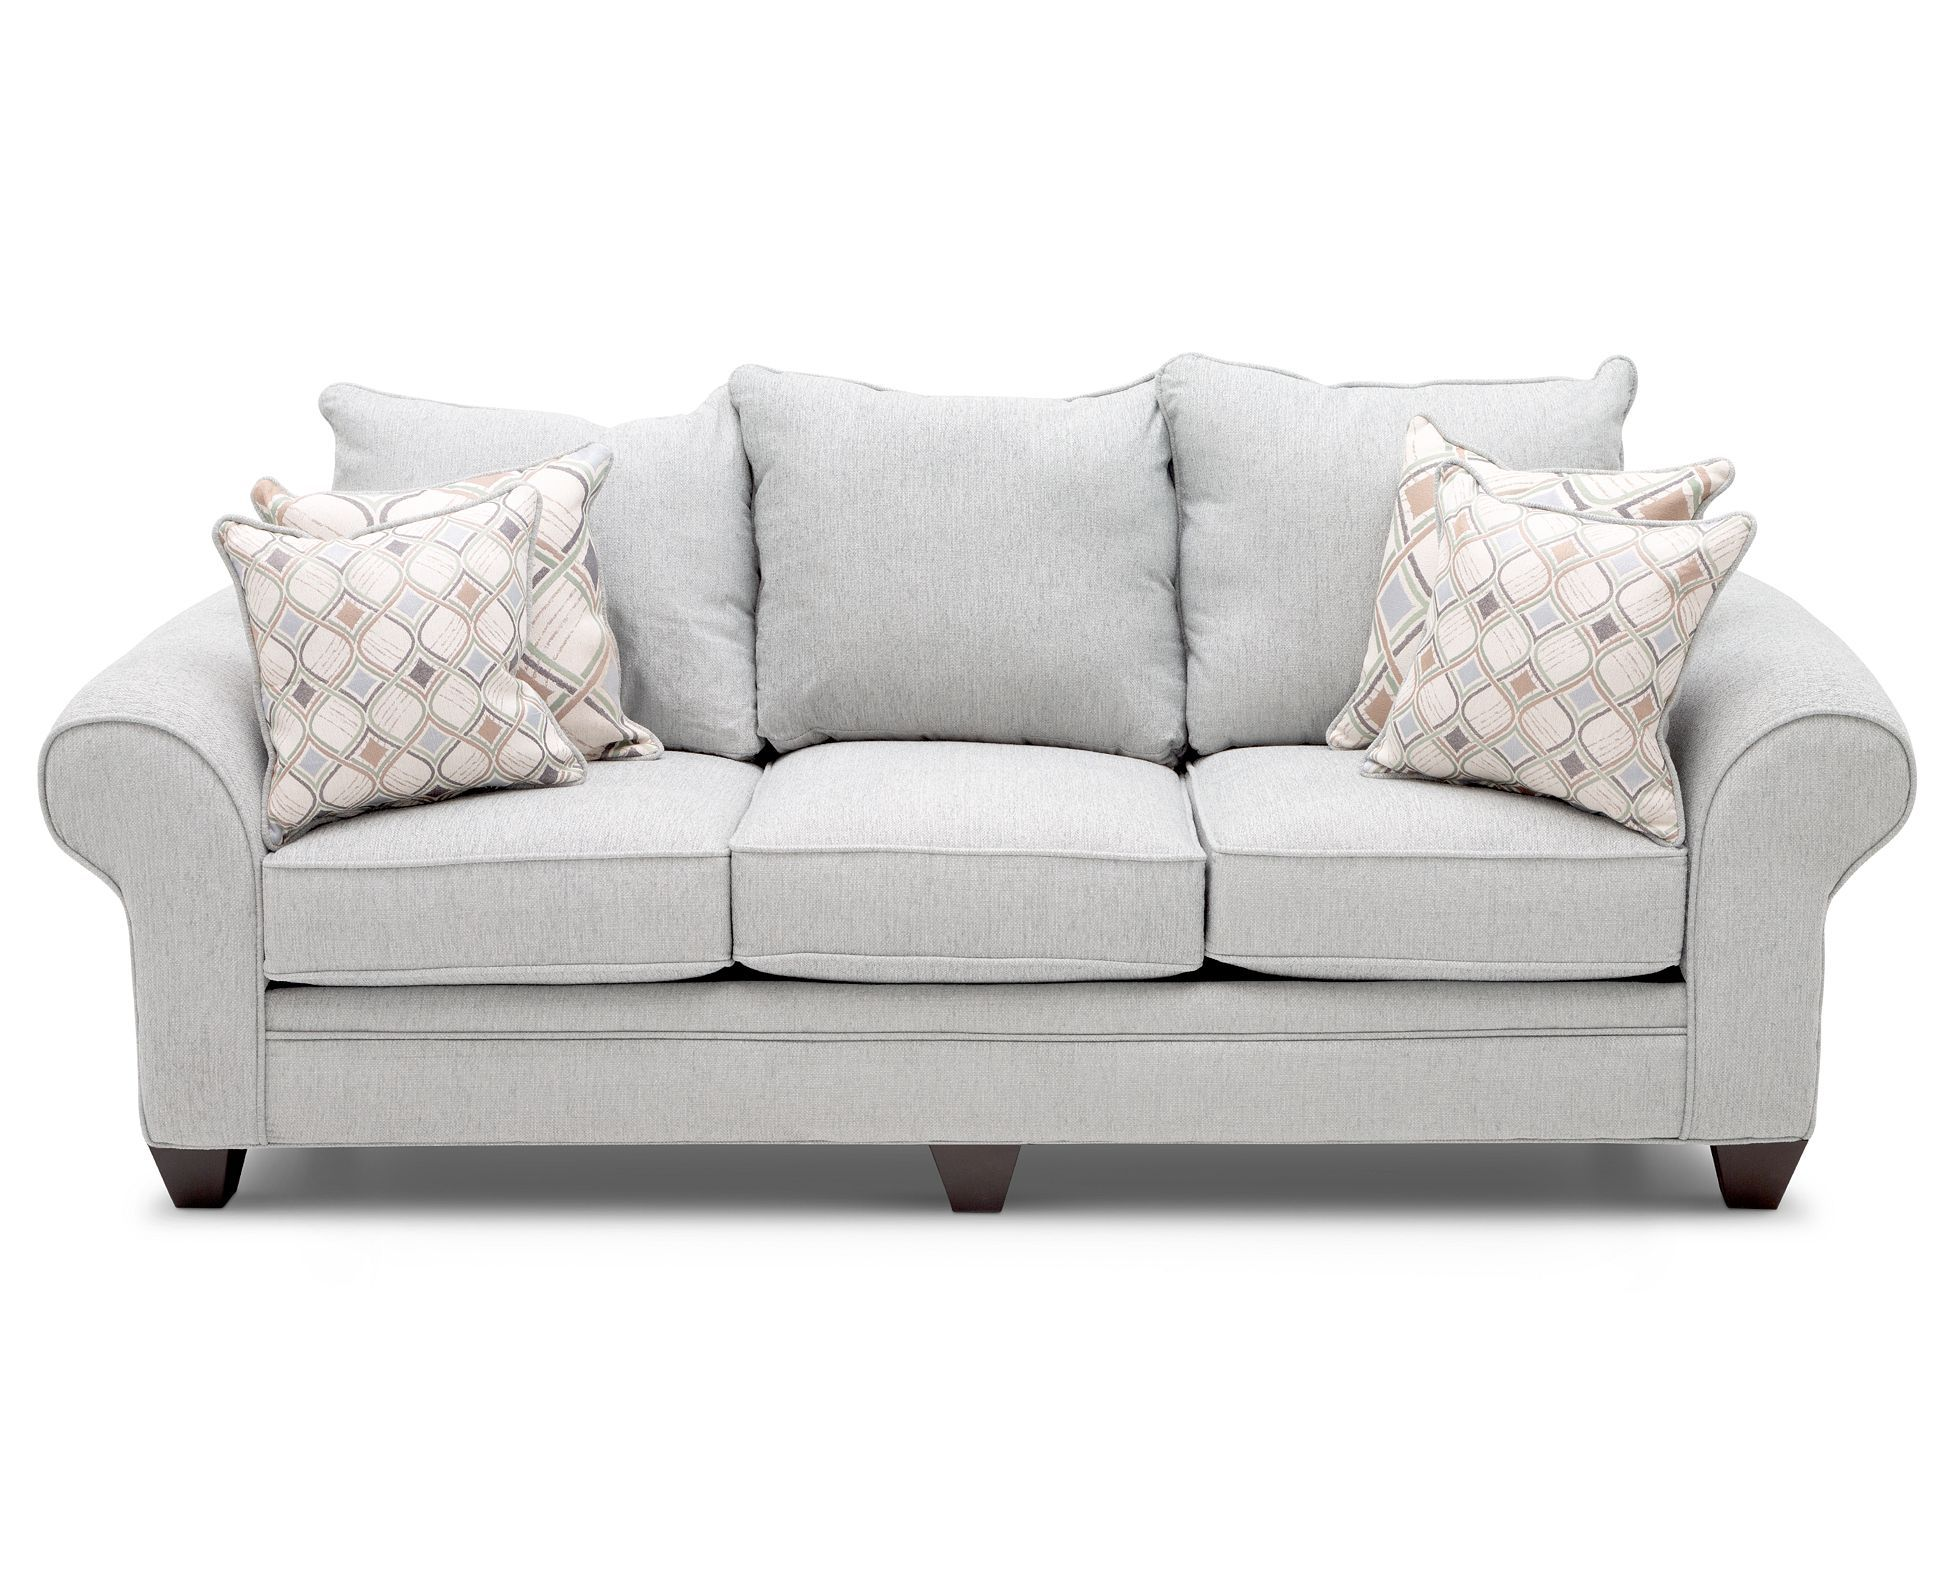 Skylar Sofa Furniture Sofa Set Sofa Store Sofa